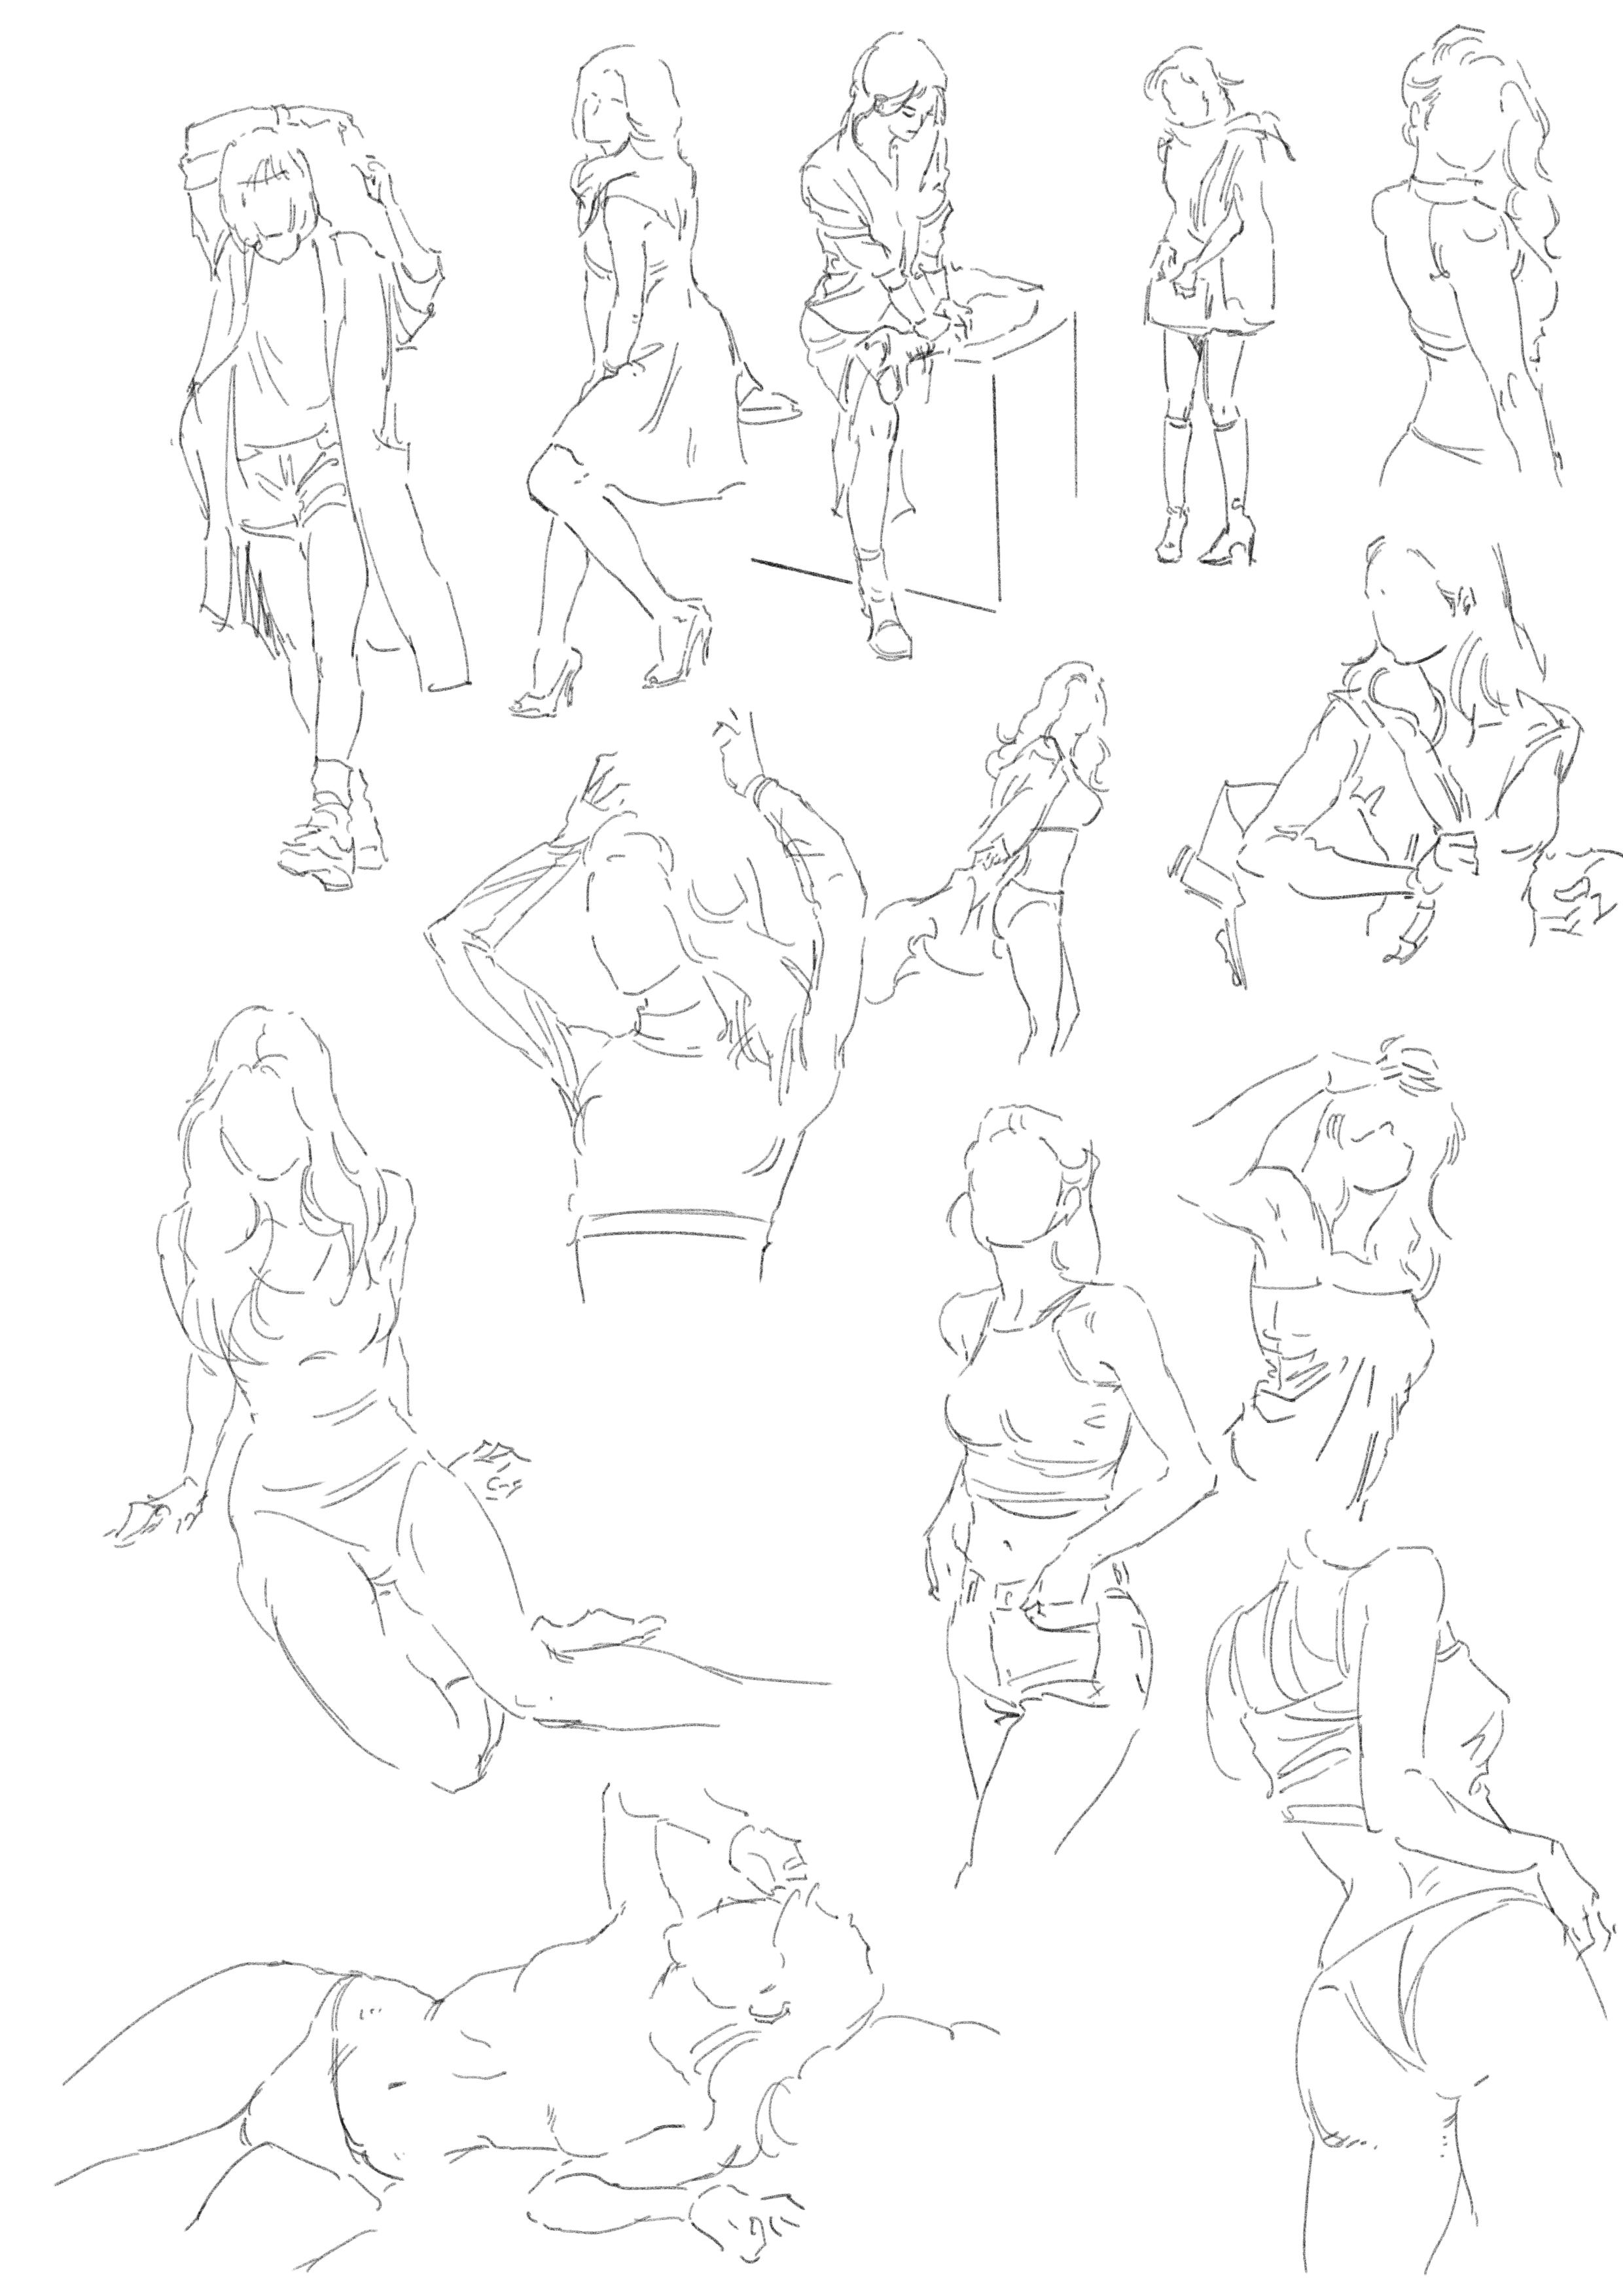 female study by Ian Willard Art poses, Drawings, Line art